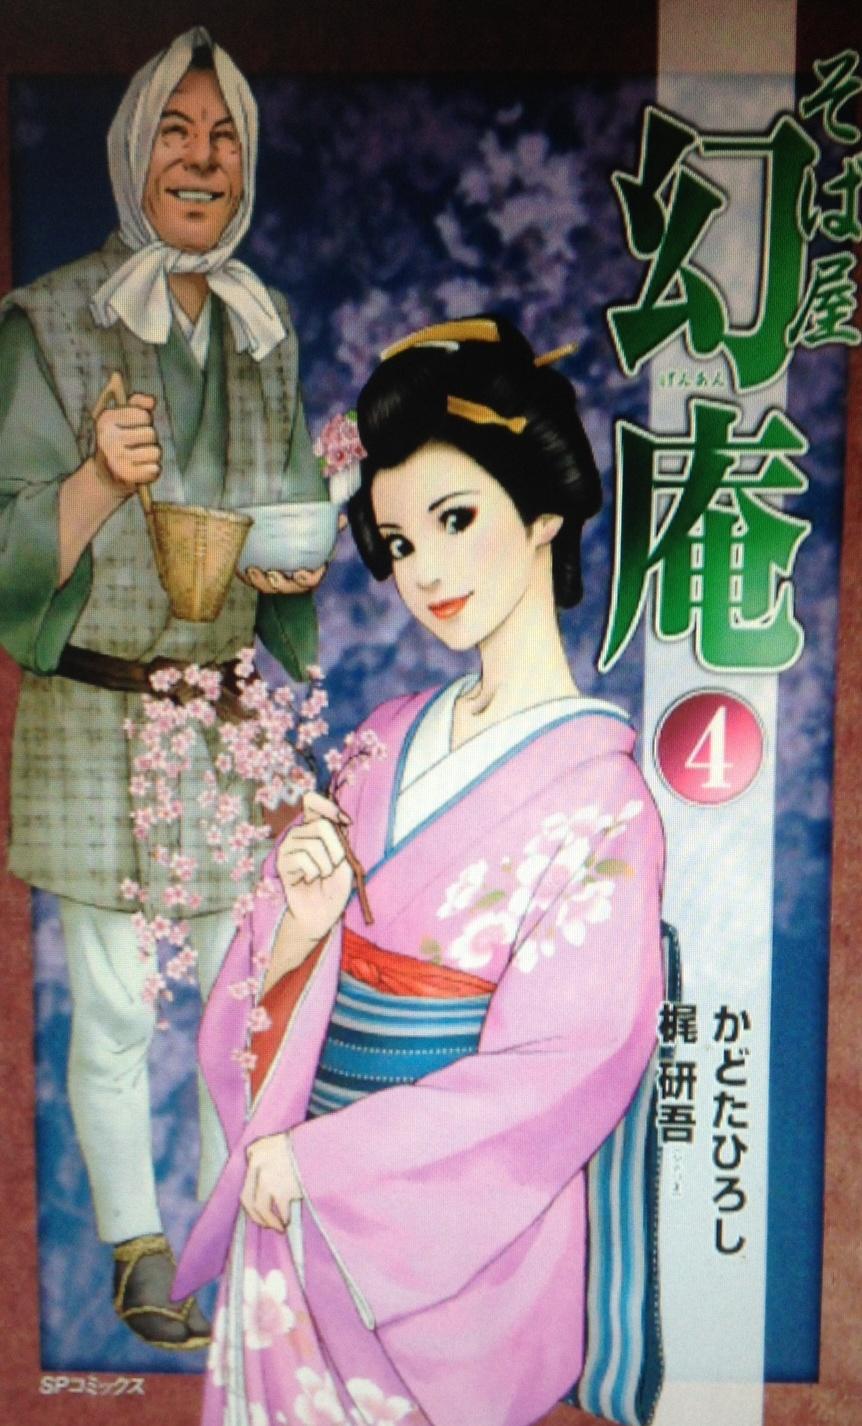 TSUTAYAのコミックレンタル実施店が500店に 今後も実施店舗を拡大_b0163004_952647.jpg